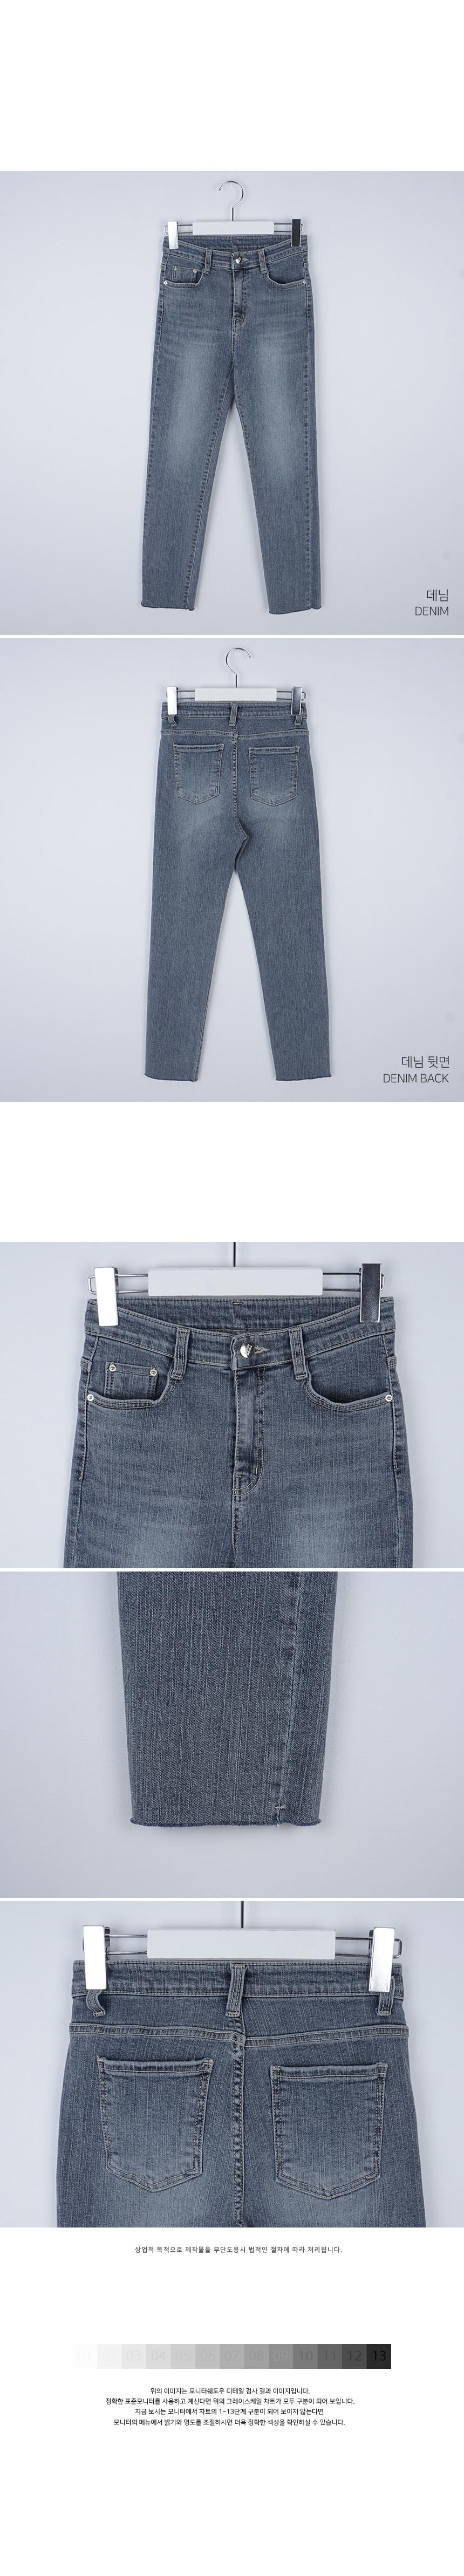 Crushed denim pants